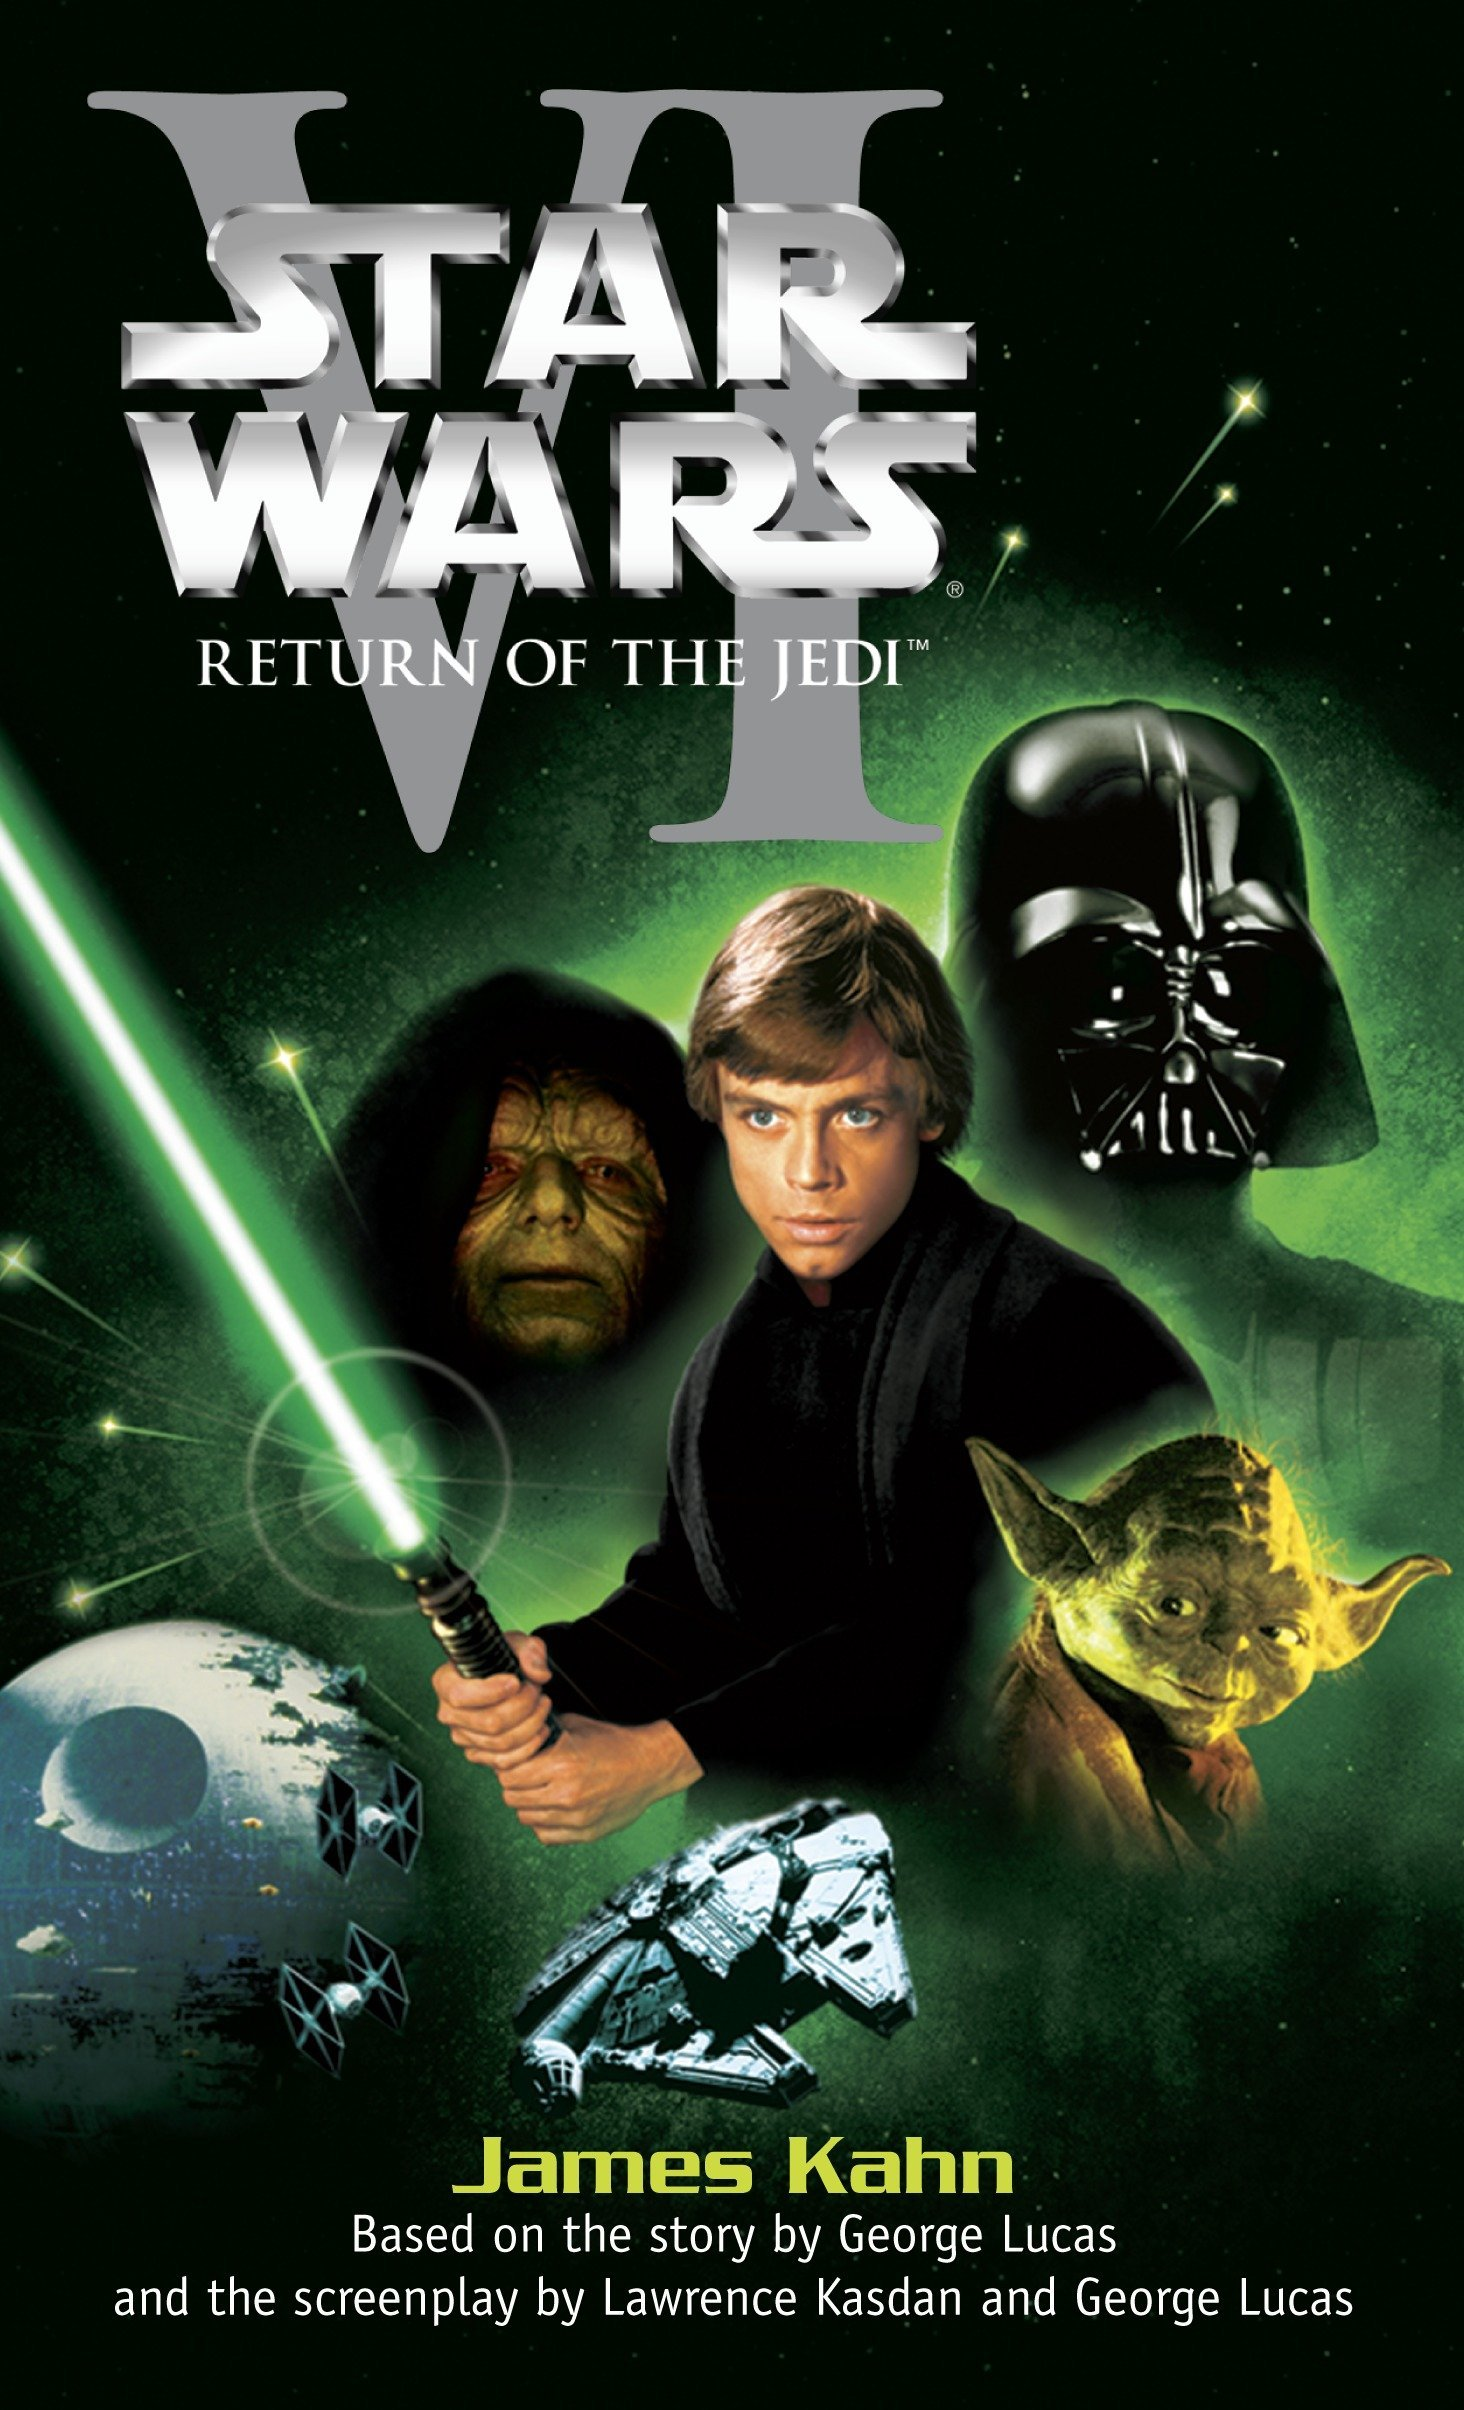 Amazon.com: Star Wars : Return of the Jedi (9780345307675): Kahn, James:  Books